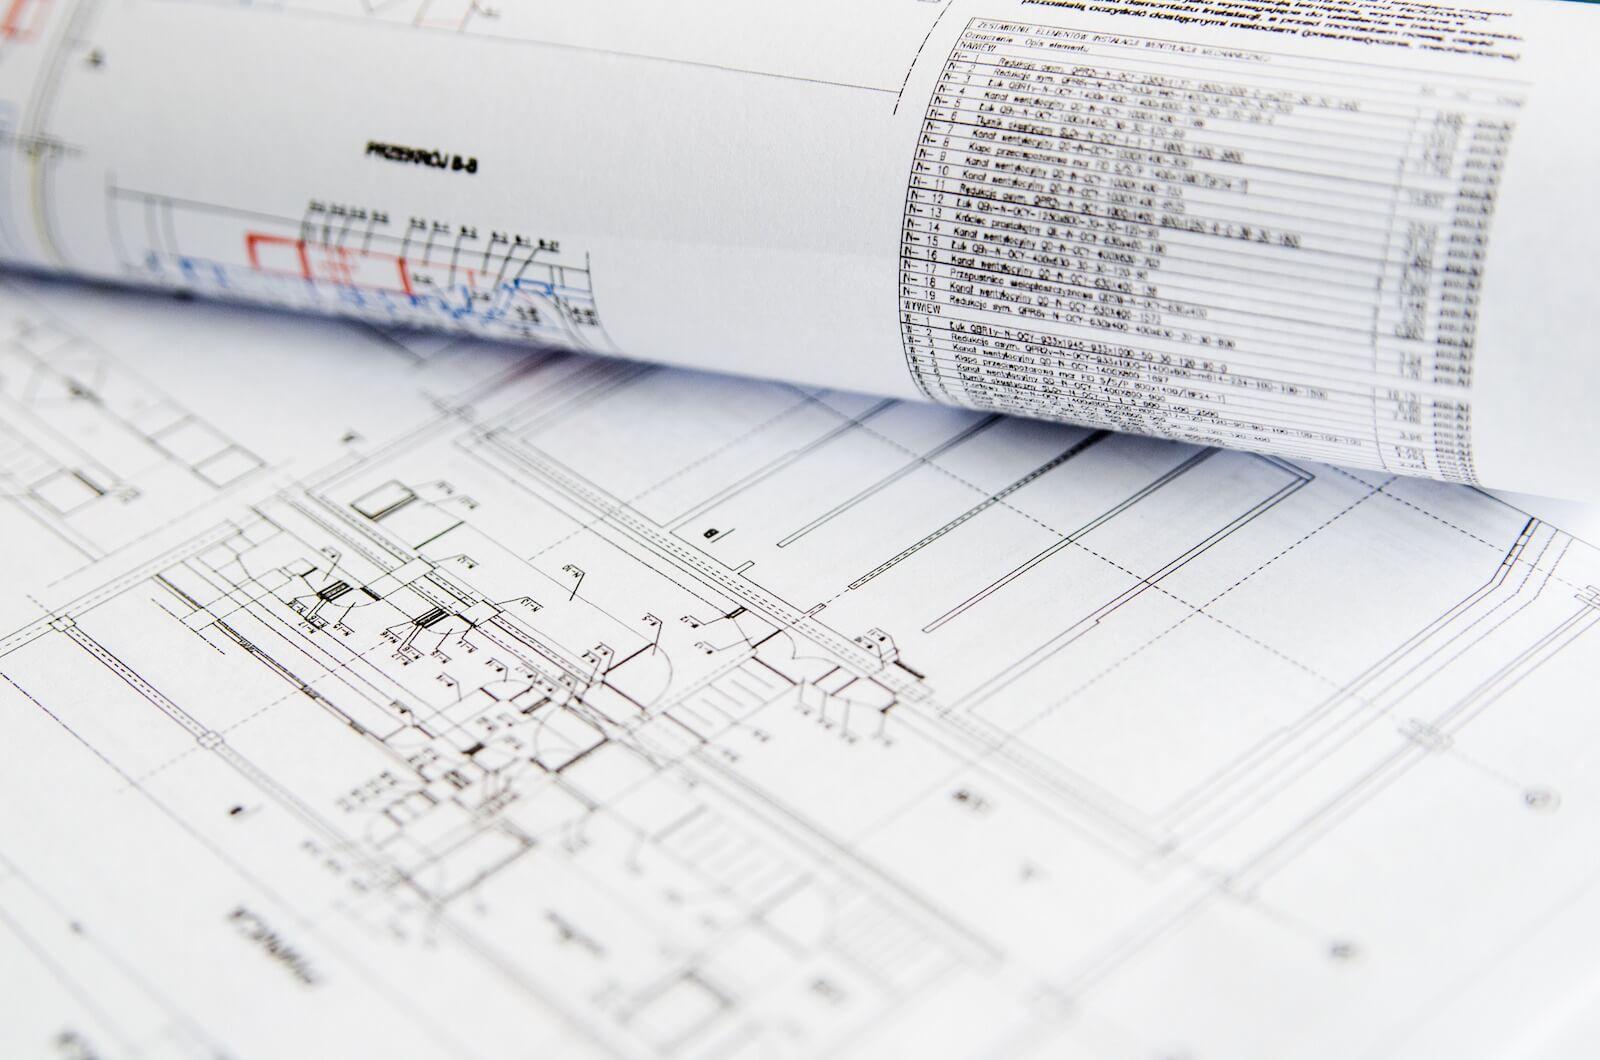 Progetti impresa edile